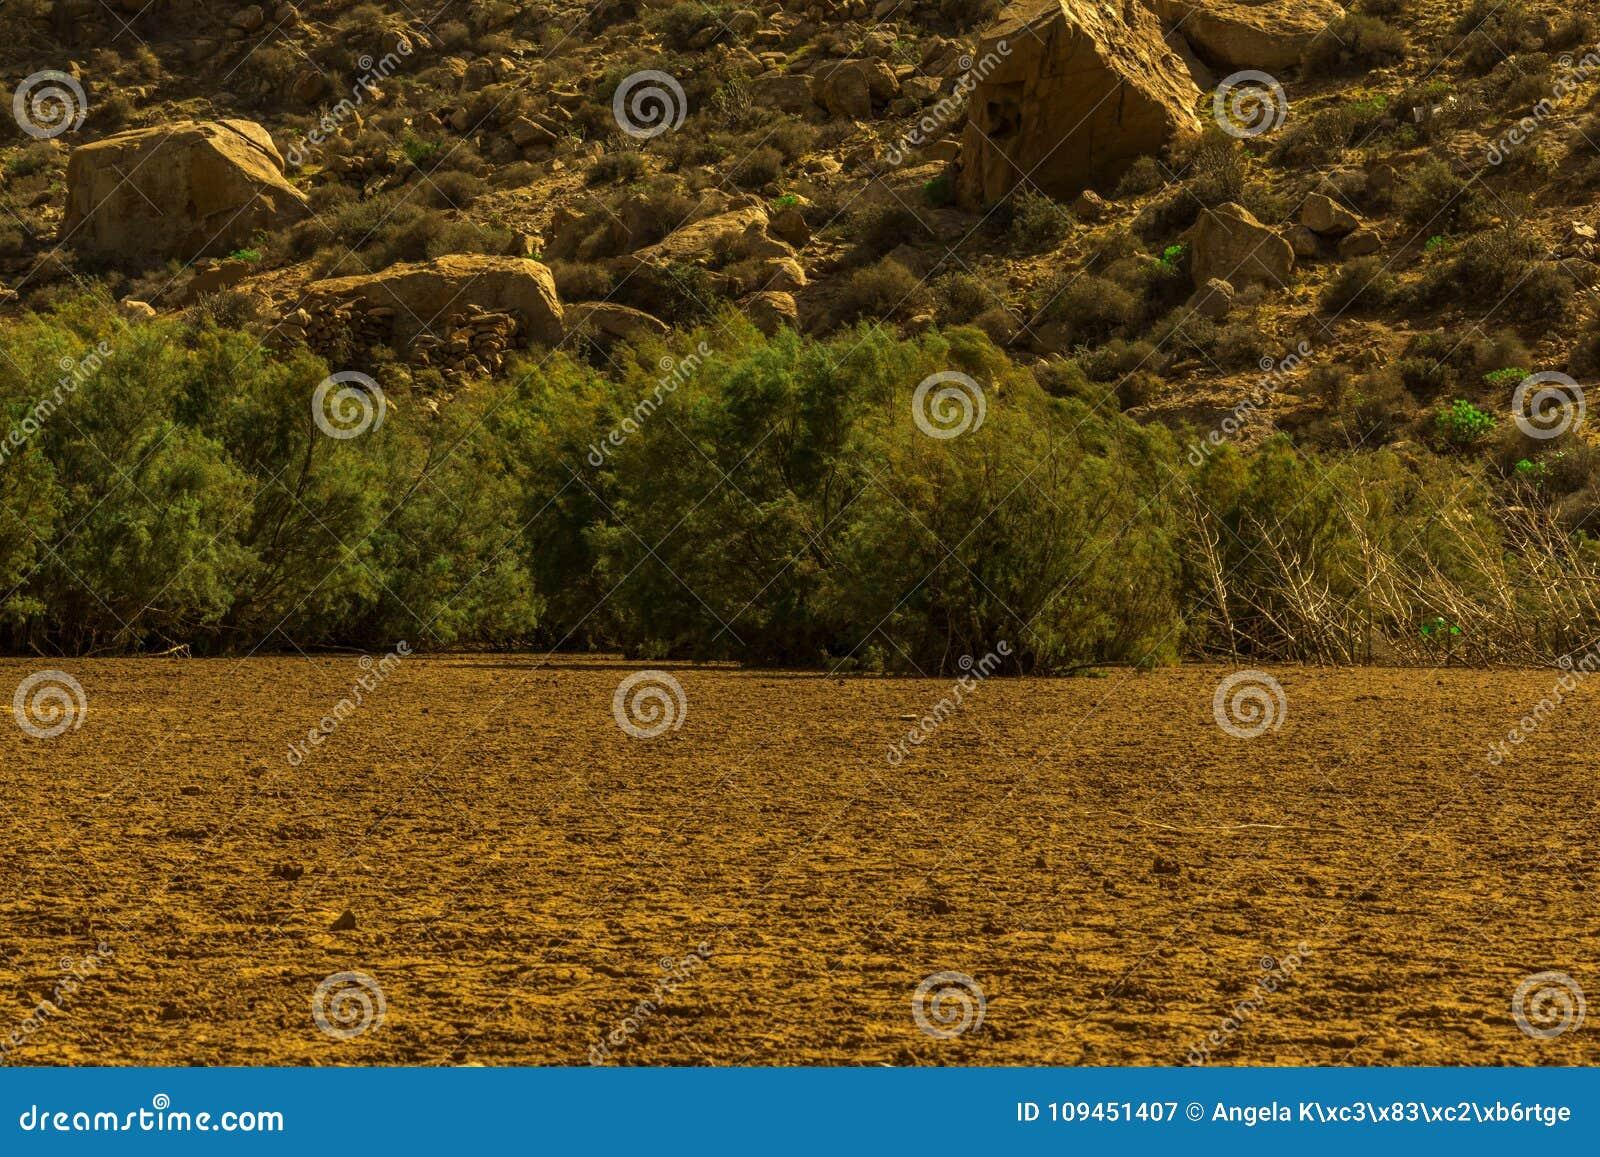 Сухой резервуар с горами